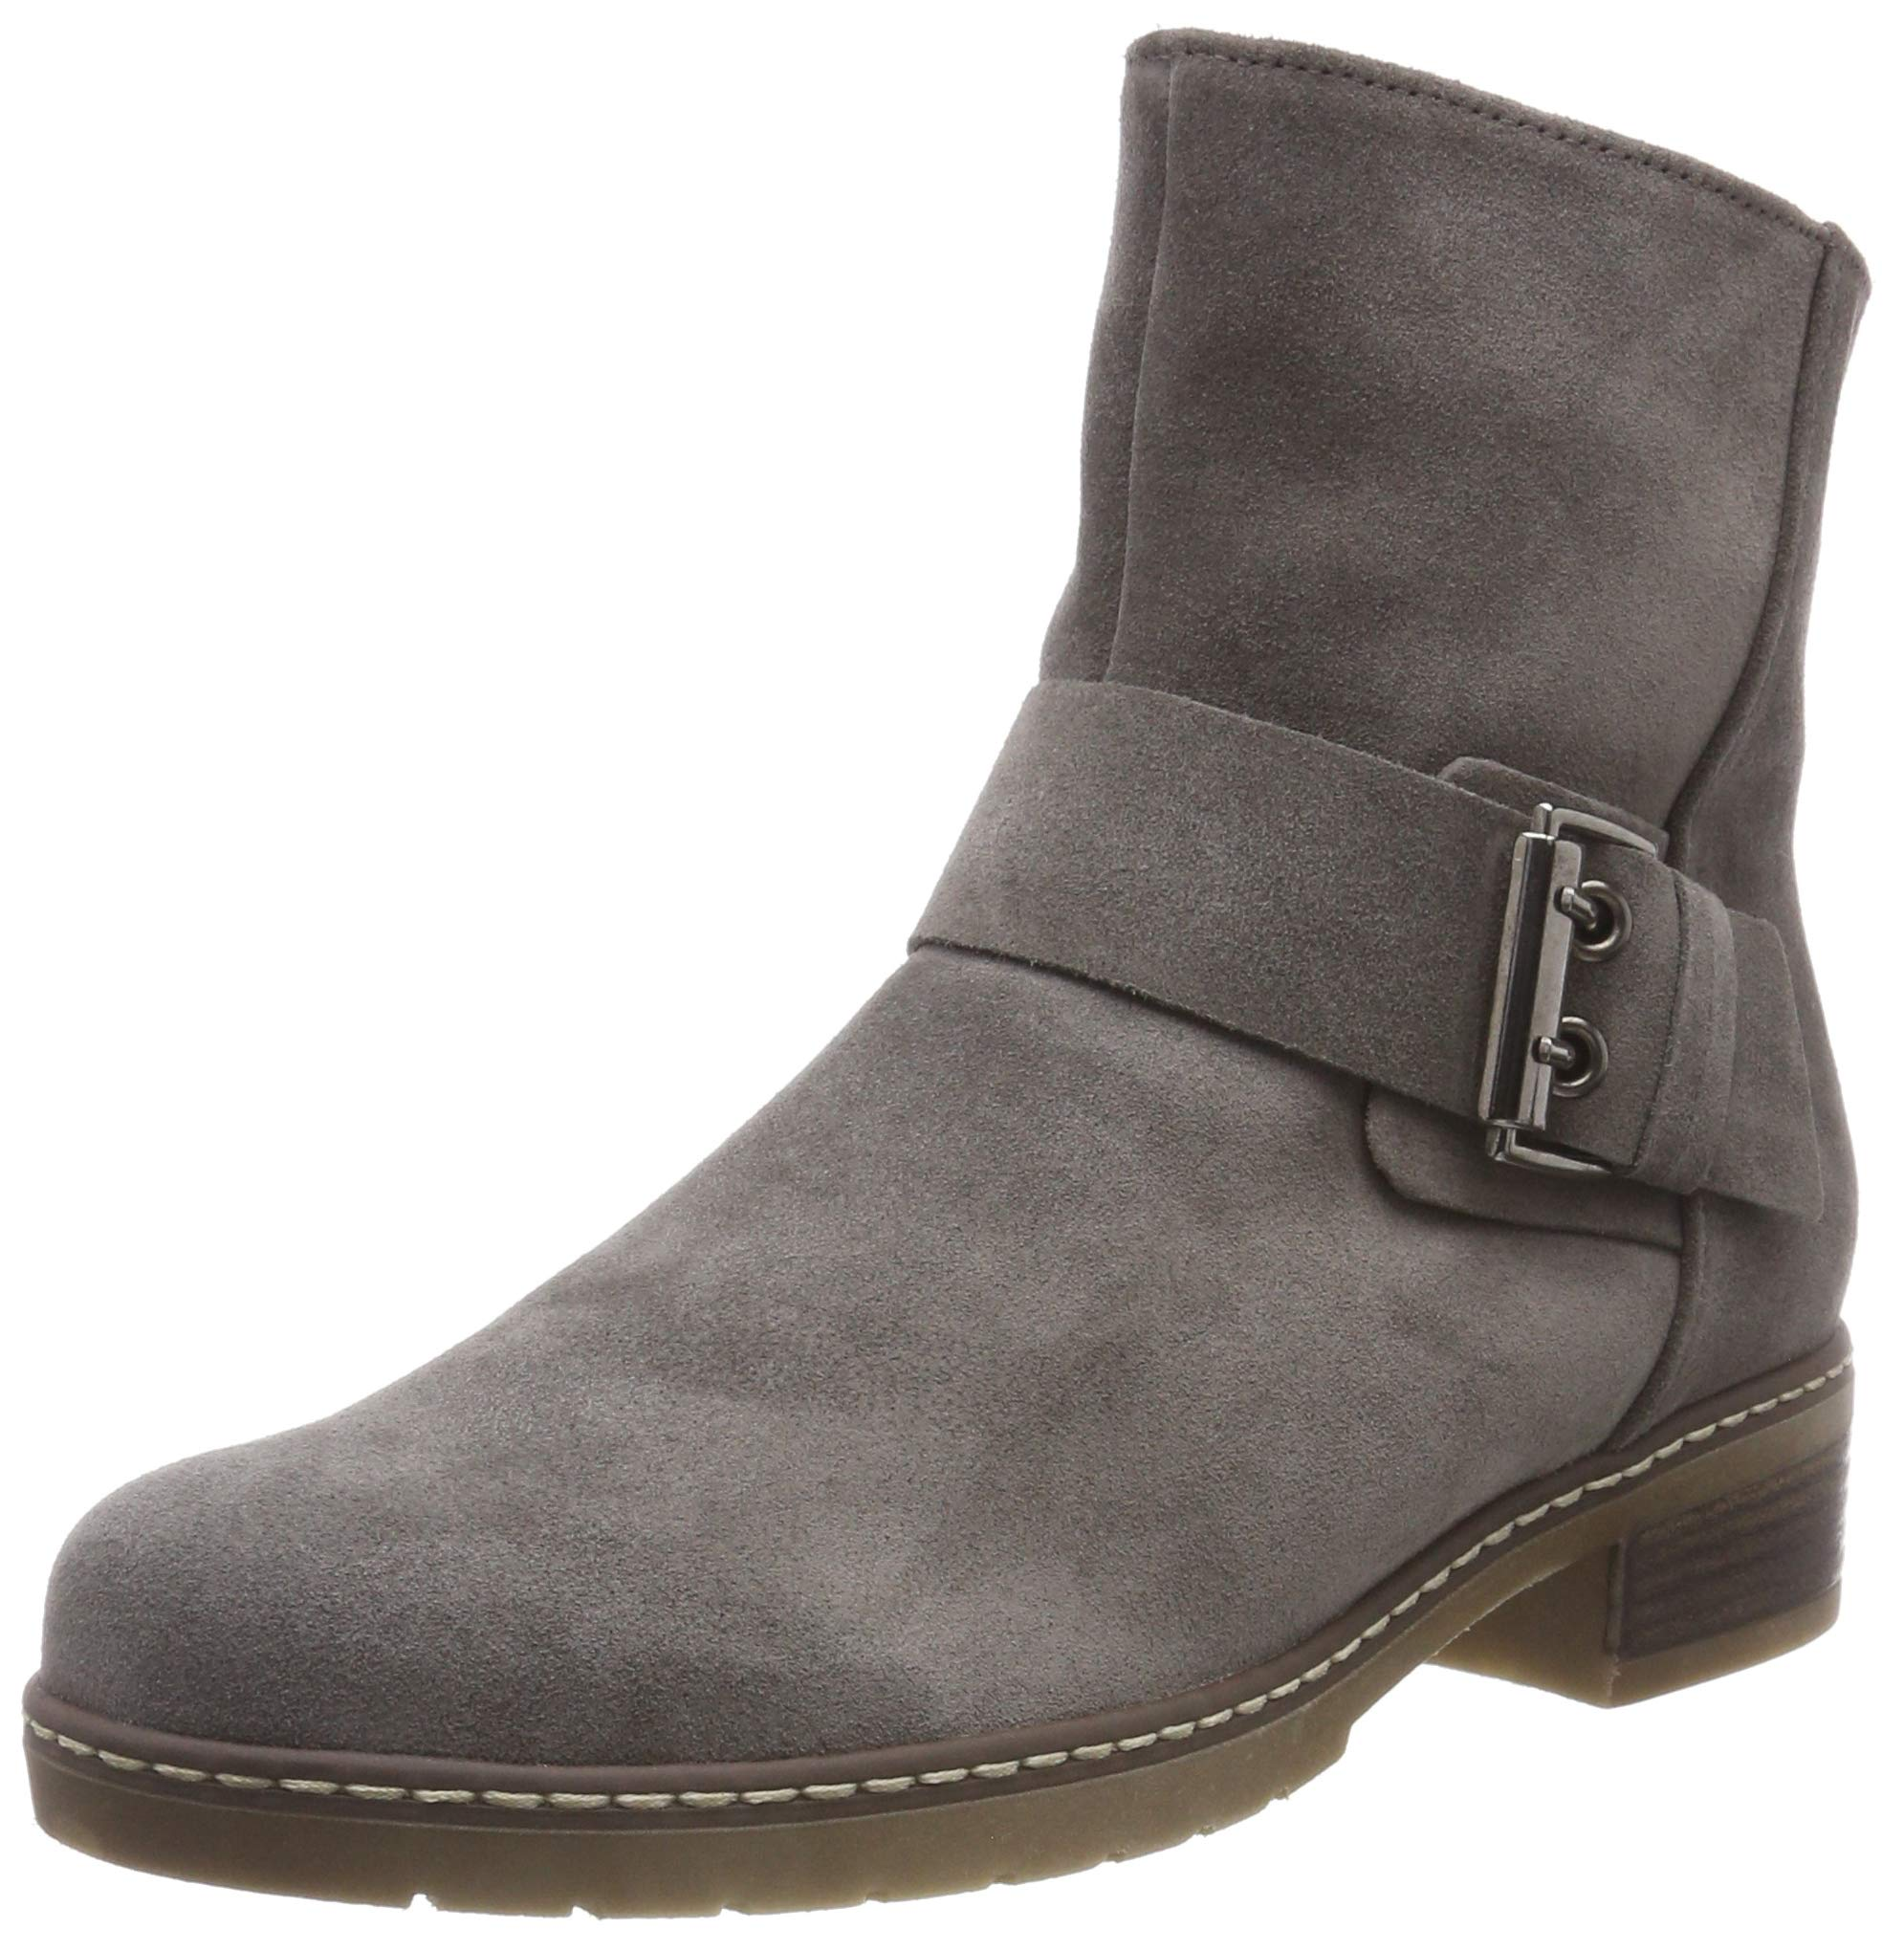 Shoes SportBotines Comfort Gabor FemmeMarronwallabymicro3238 Eu thrCxBQds